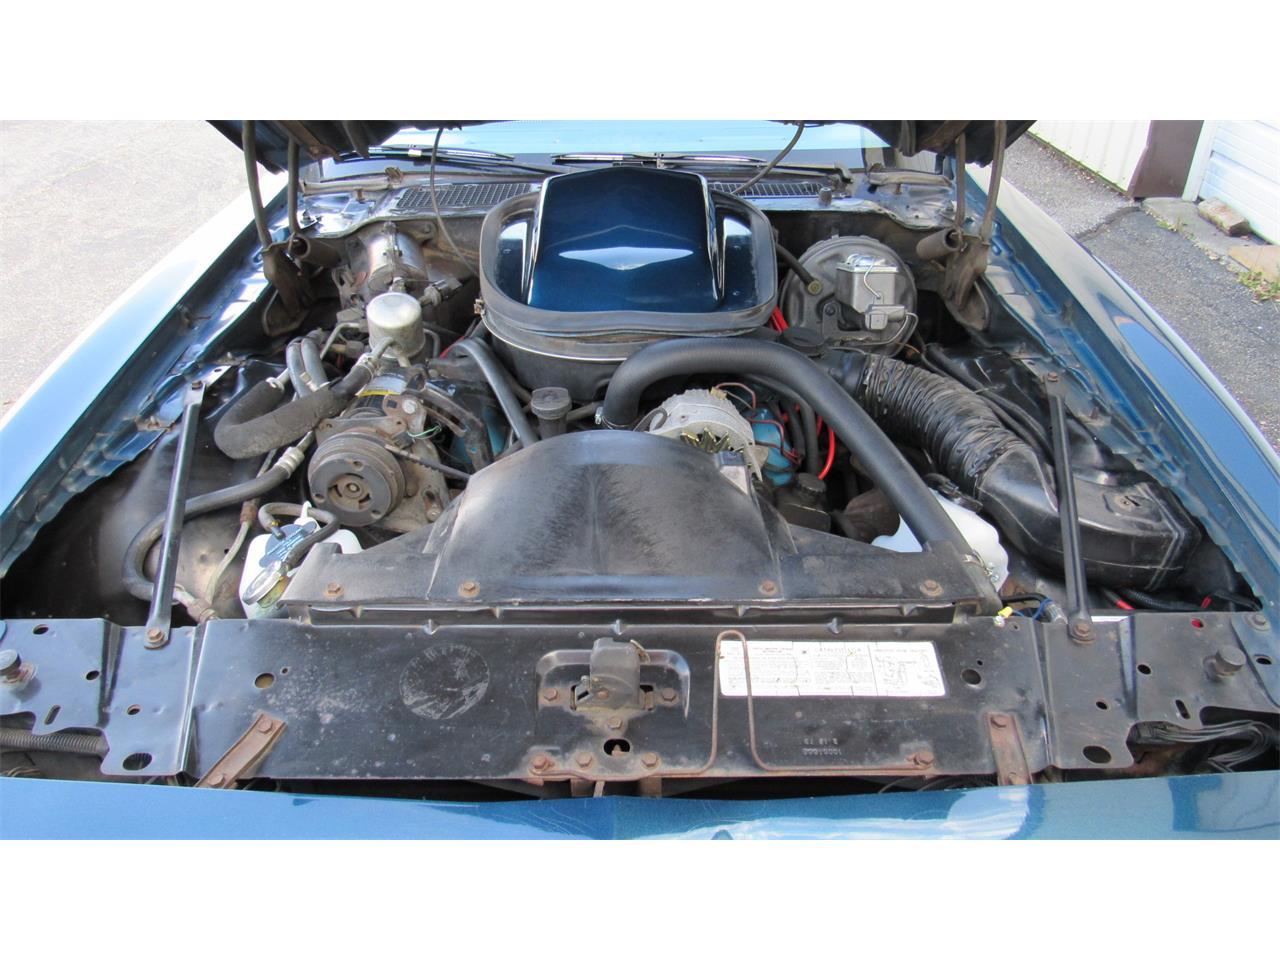 Pontiac Firebird Trans Am 1979 prix tout compris